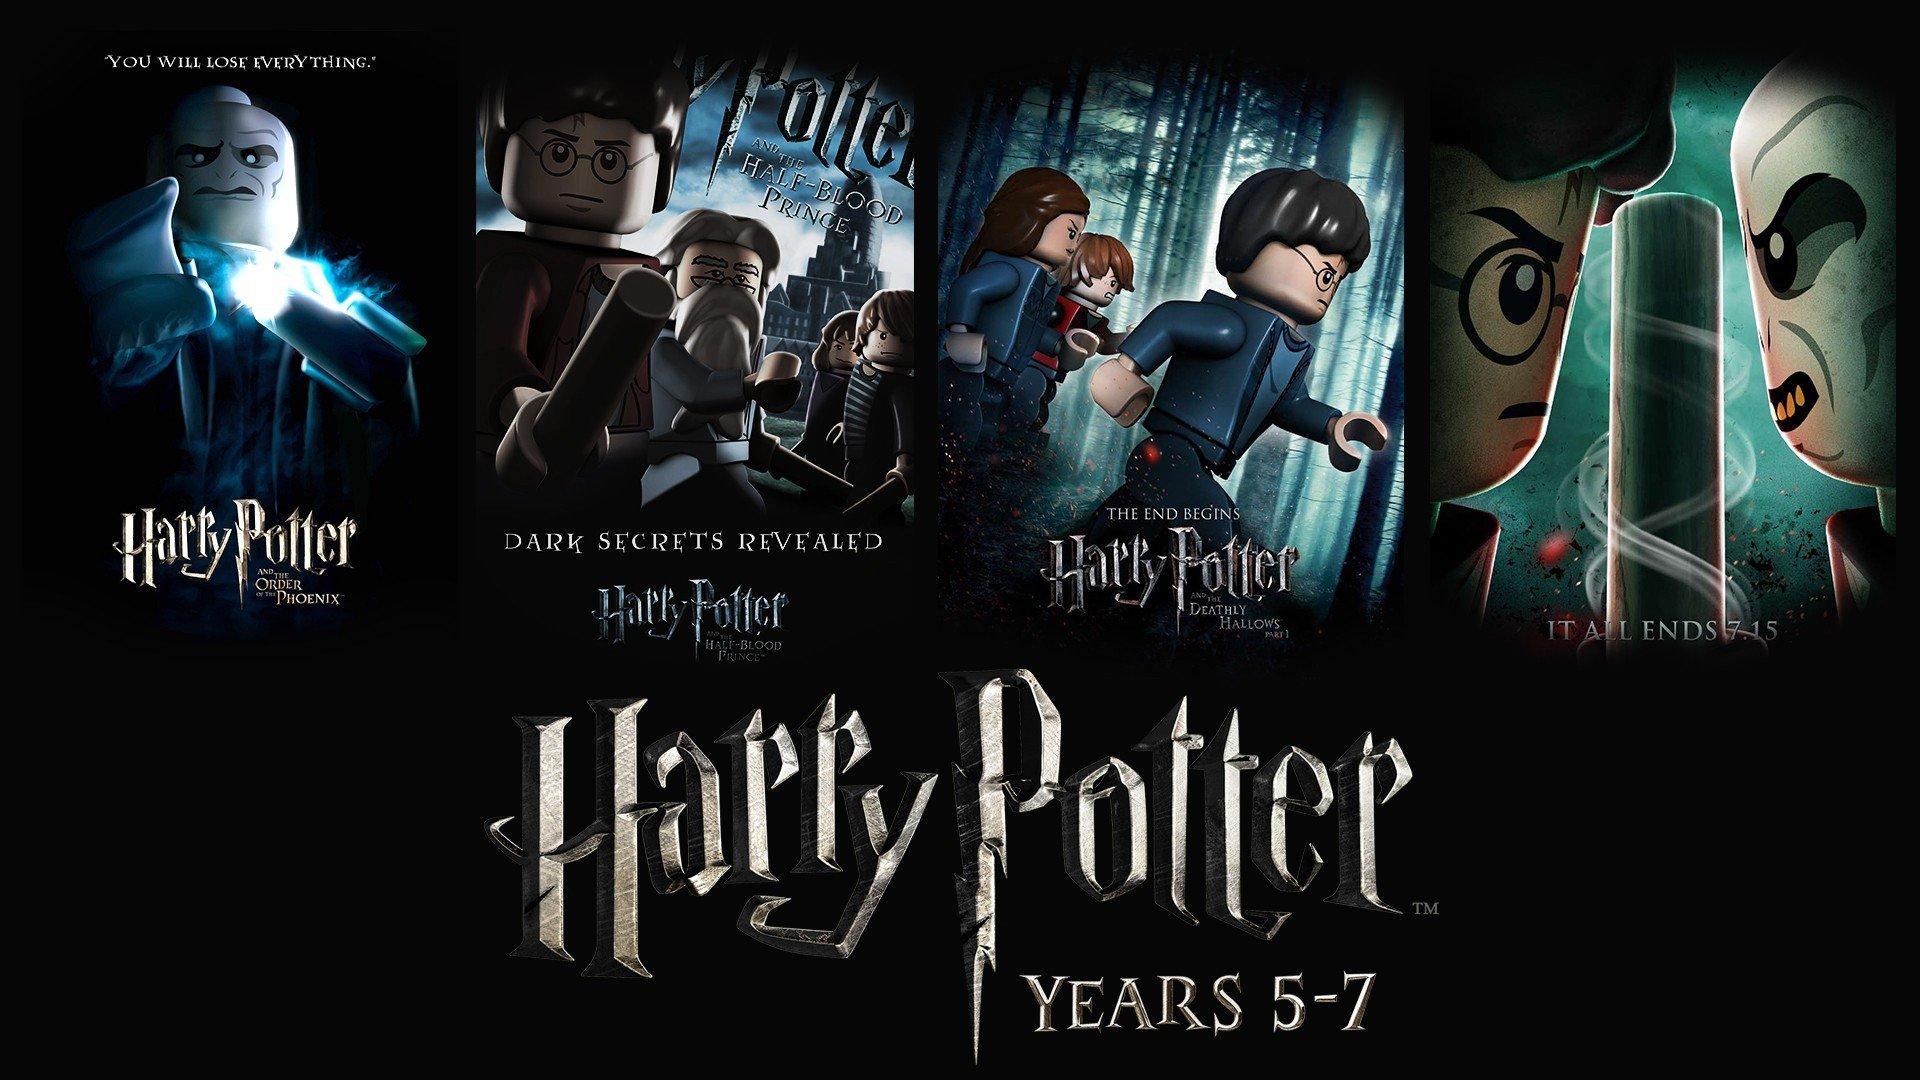 Dobby Quotes Wallpaper Harry Potter Legos Lego Harry Potter Wallpaper 1920x1080